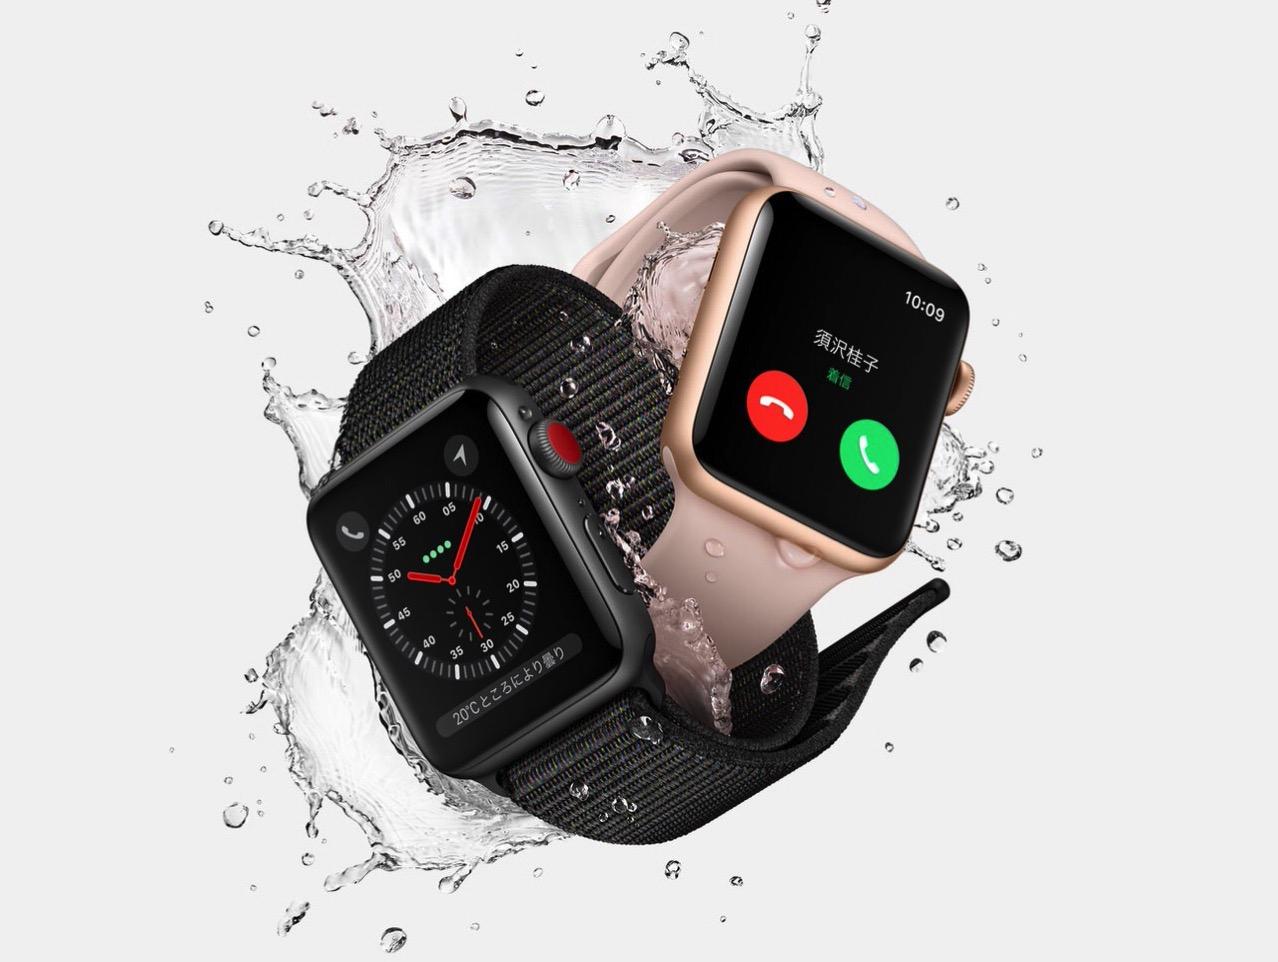 「Apple Watch Series 3」携帯電話通信機能を内蔵し9月15日より予約受付開始